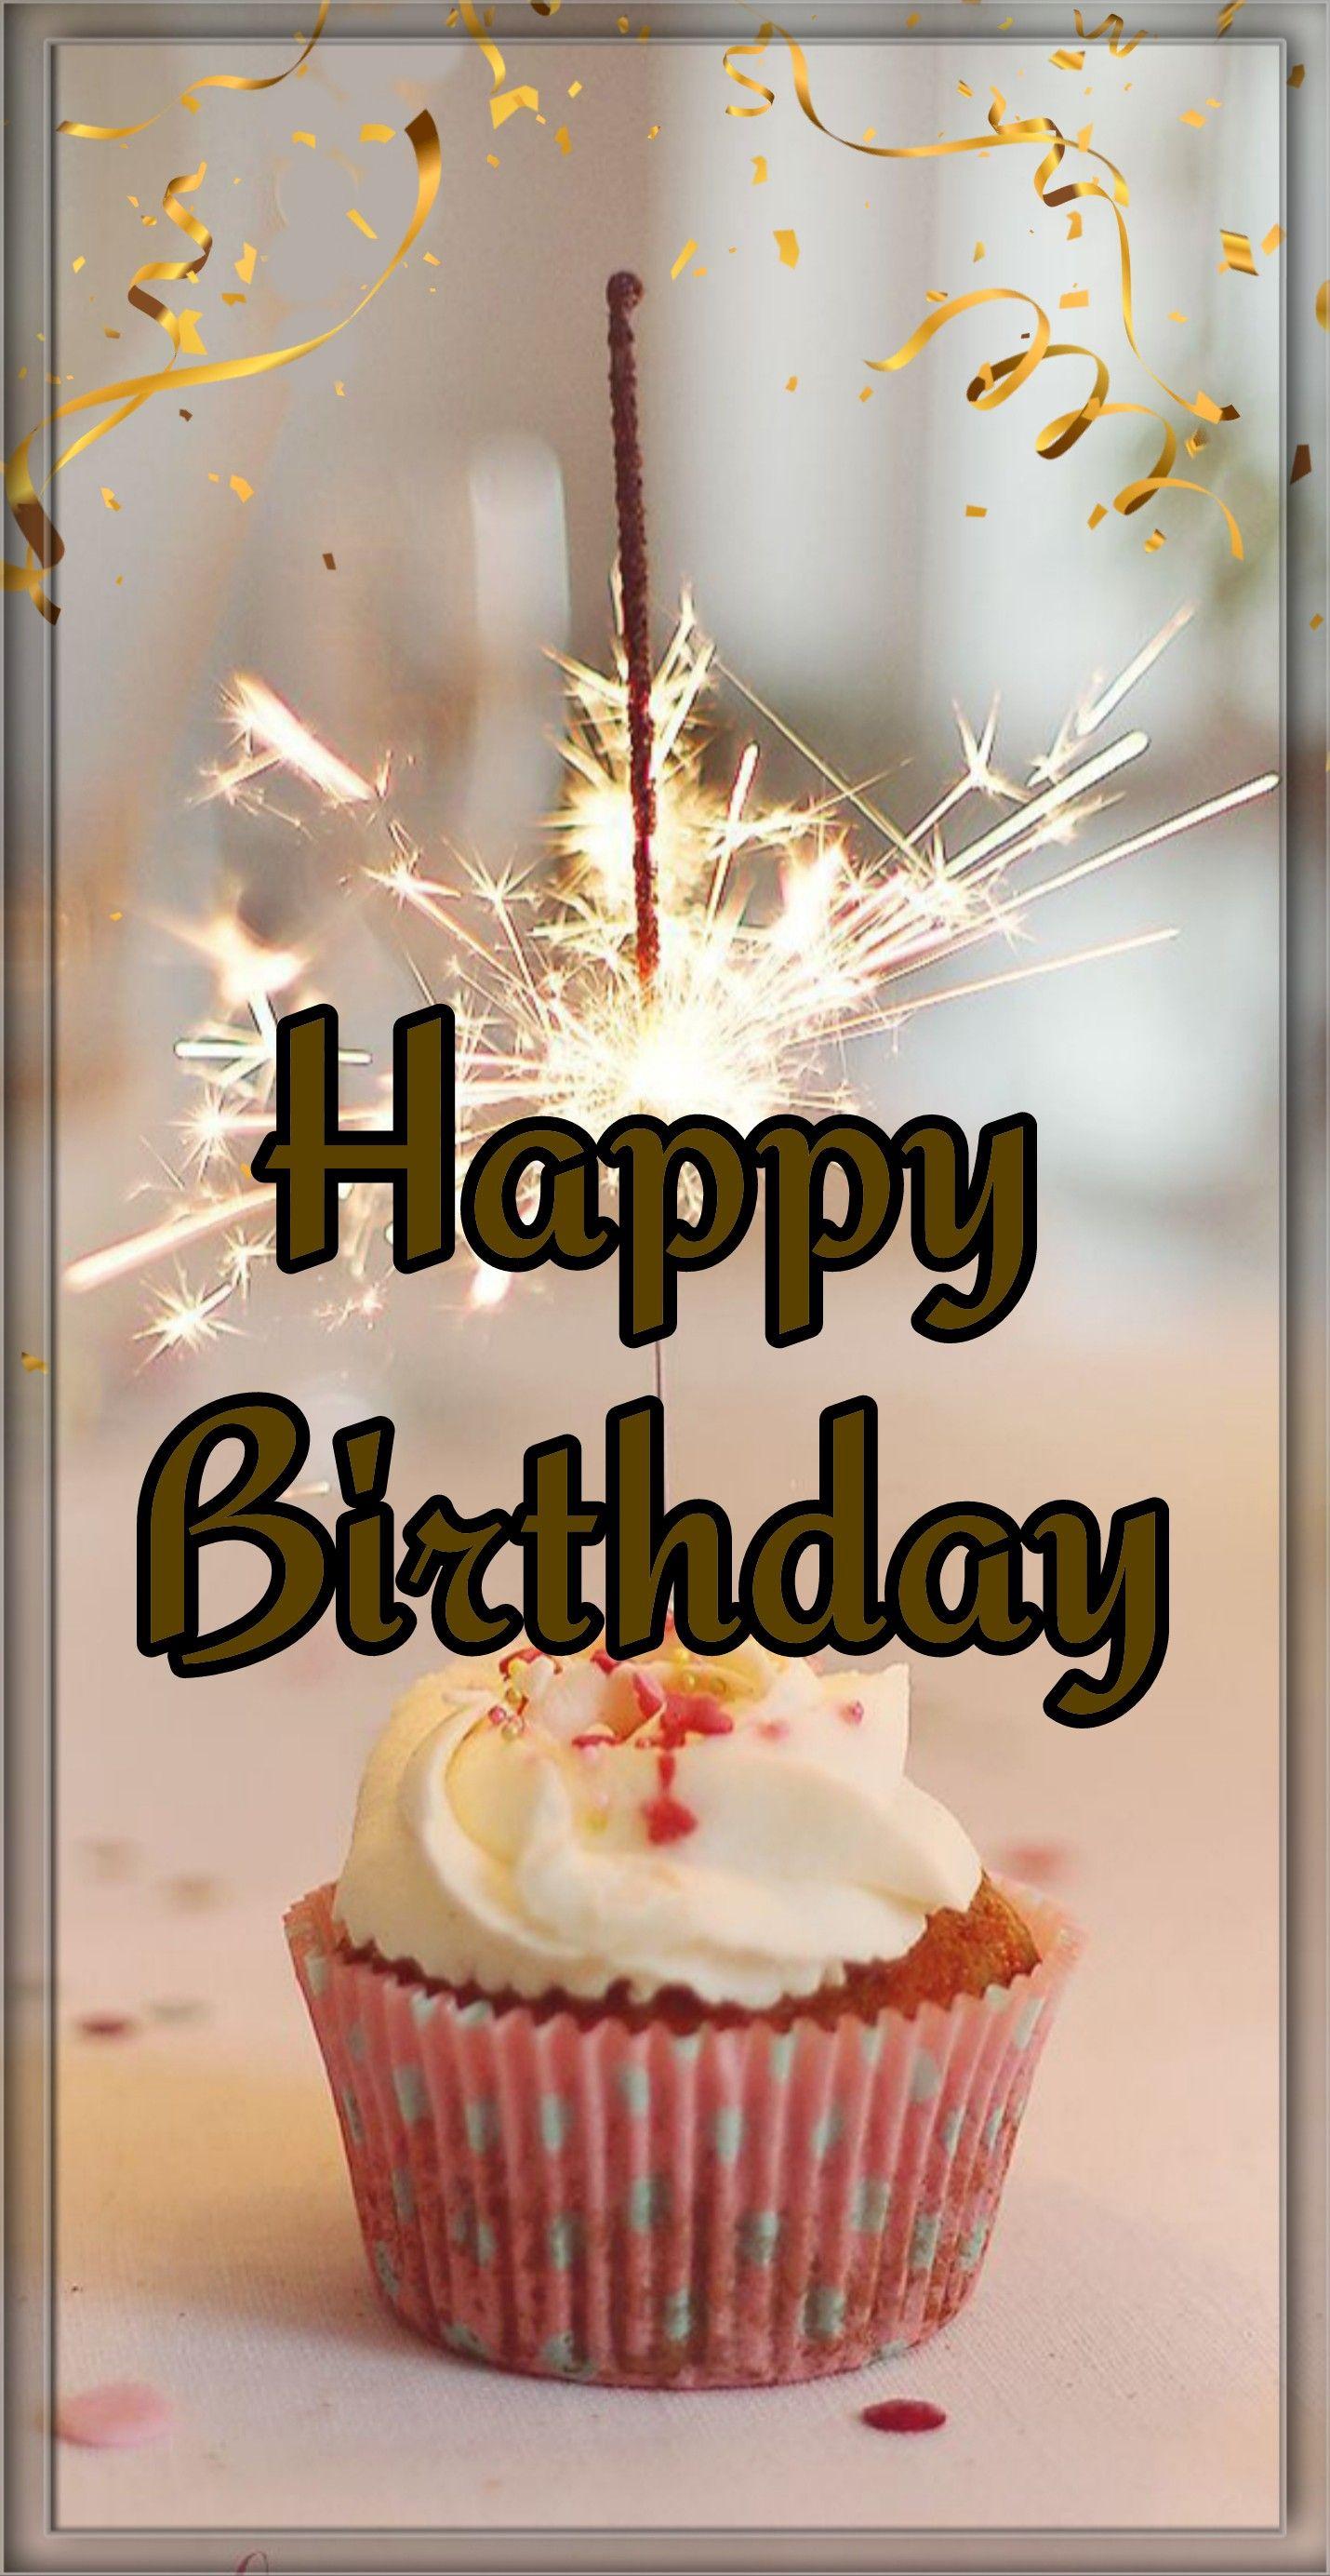 Bon Bon Sweet Treats Birthday 3D Lenticular Greetings Card